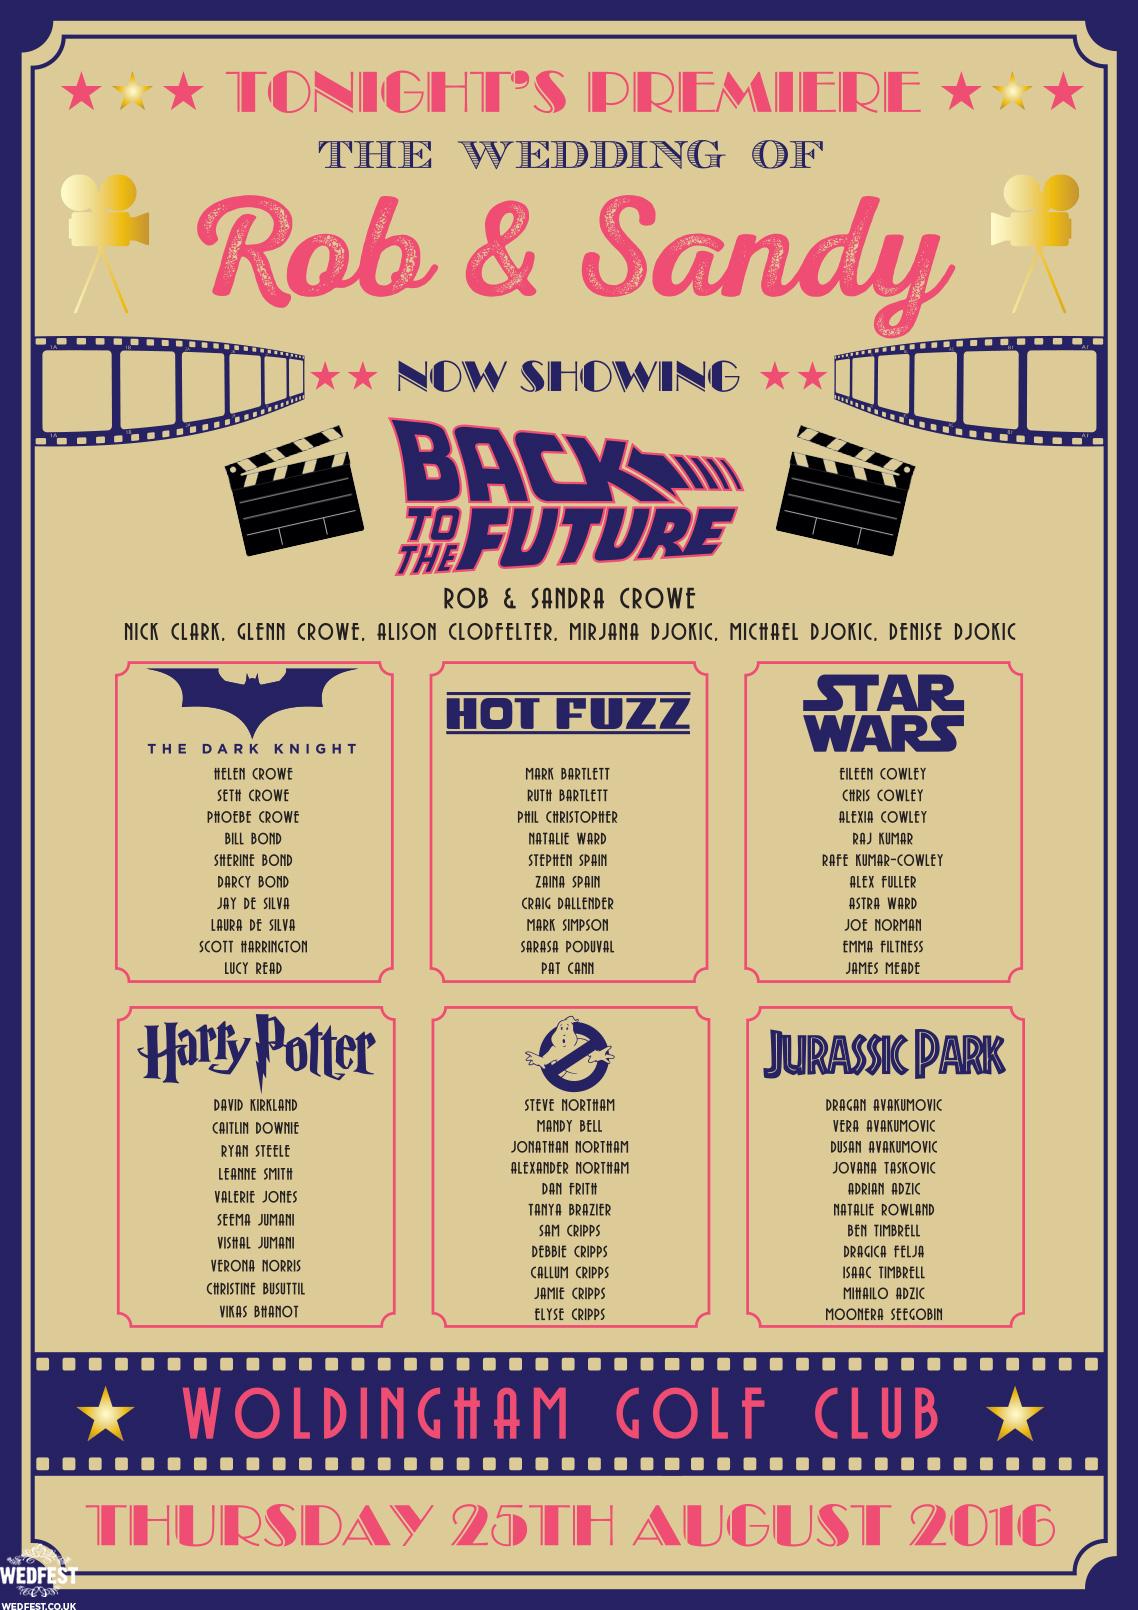 Cinema and Movie themed Wedding Stationery  WEDFEST